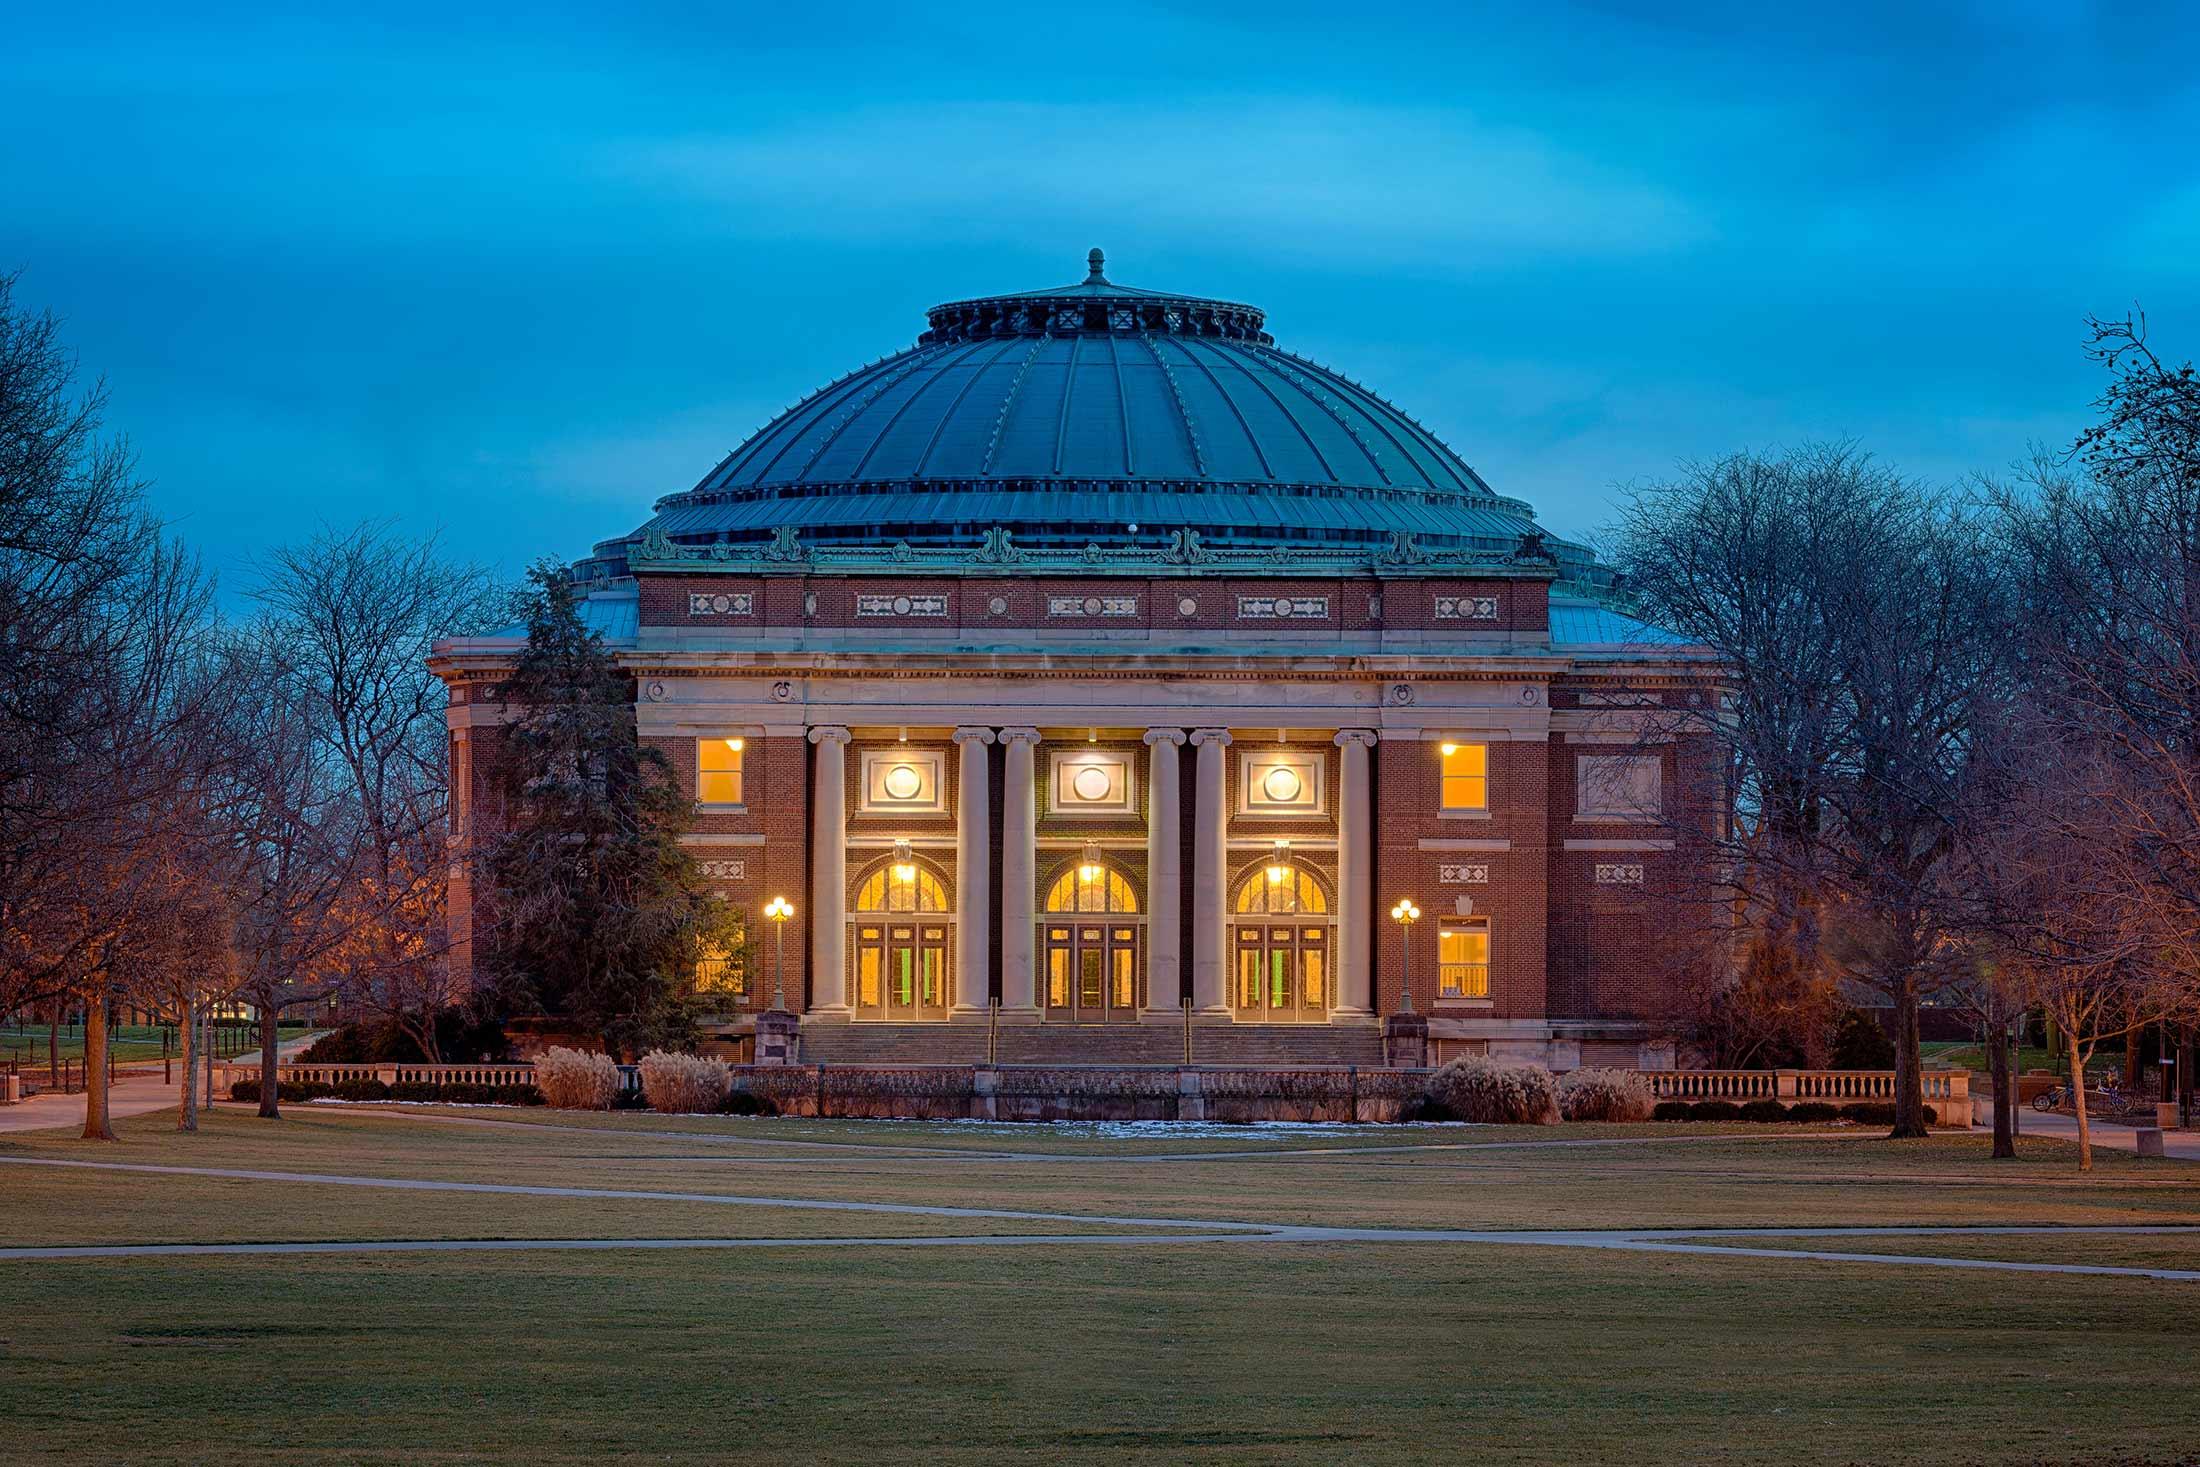 Foellinger Auditorium on the Main Quad at the University of Illinois in Urbana, Ill.